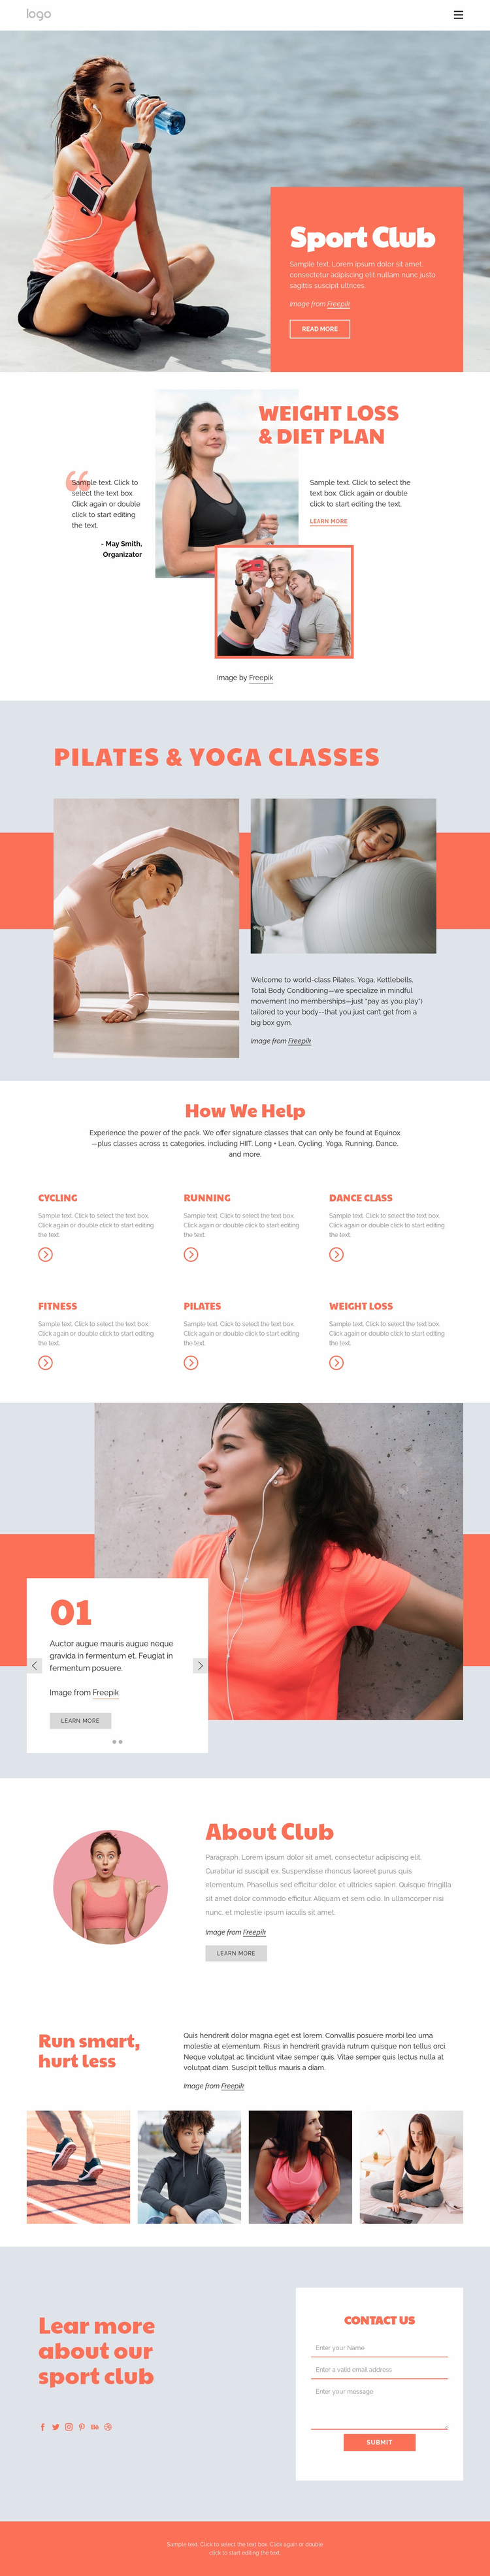 Pilates vs yoga Web Page Designer